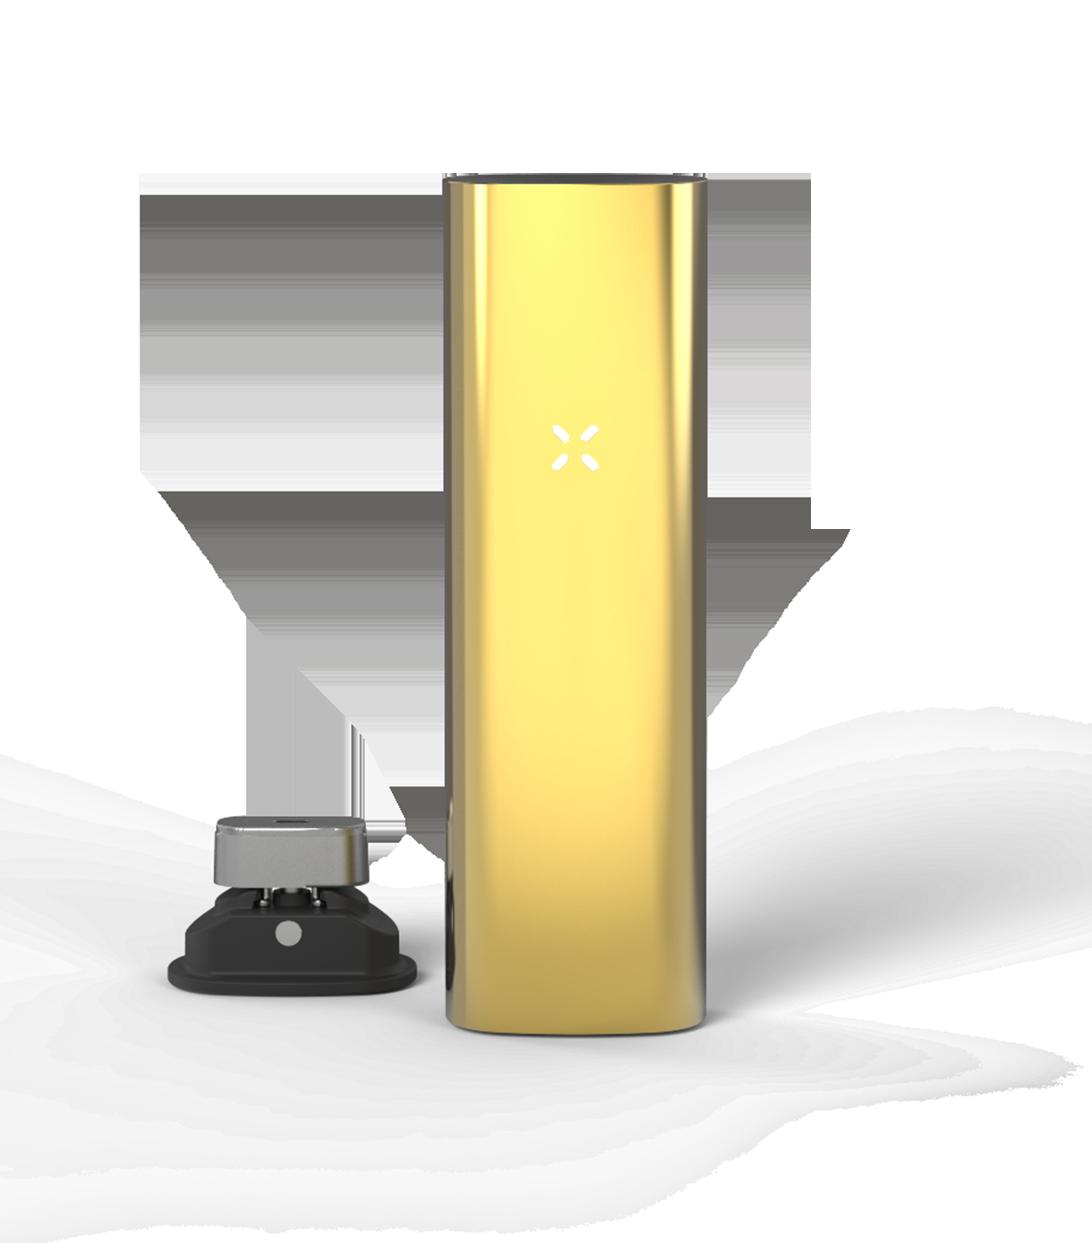 pax 3 gold